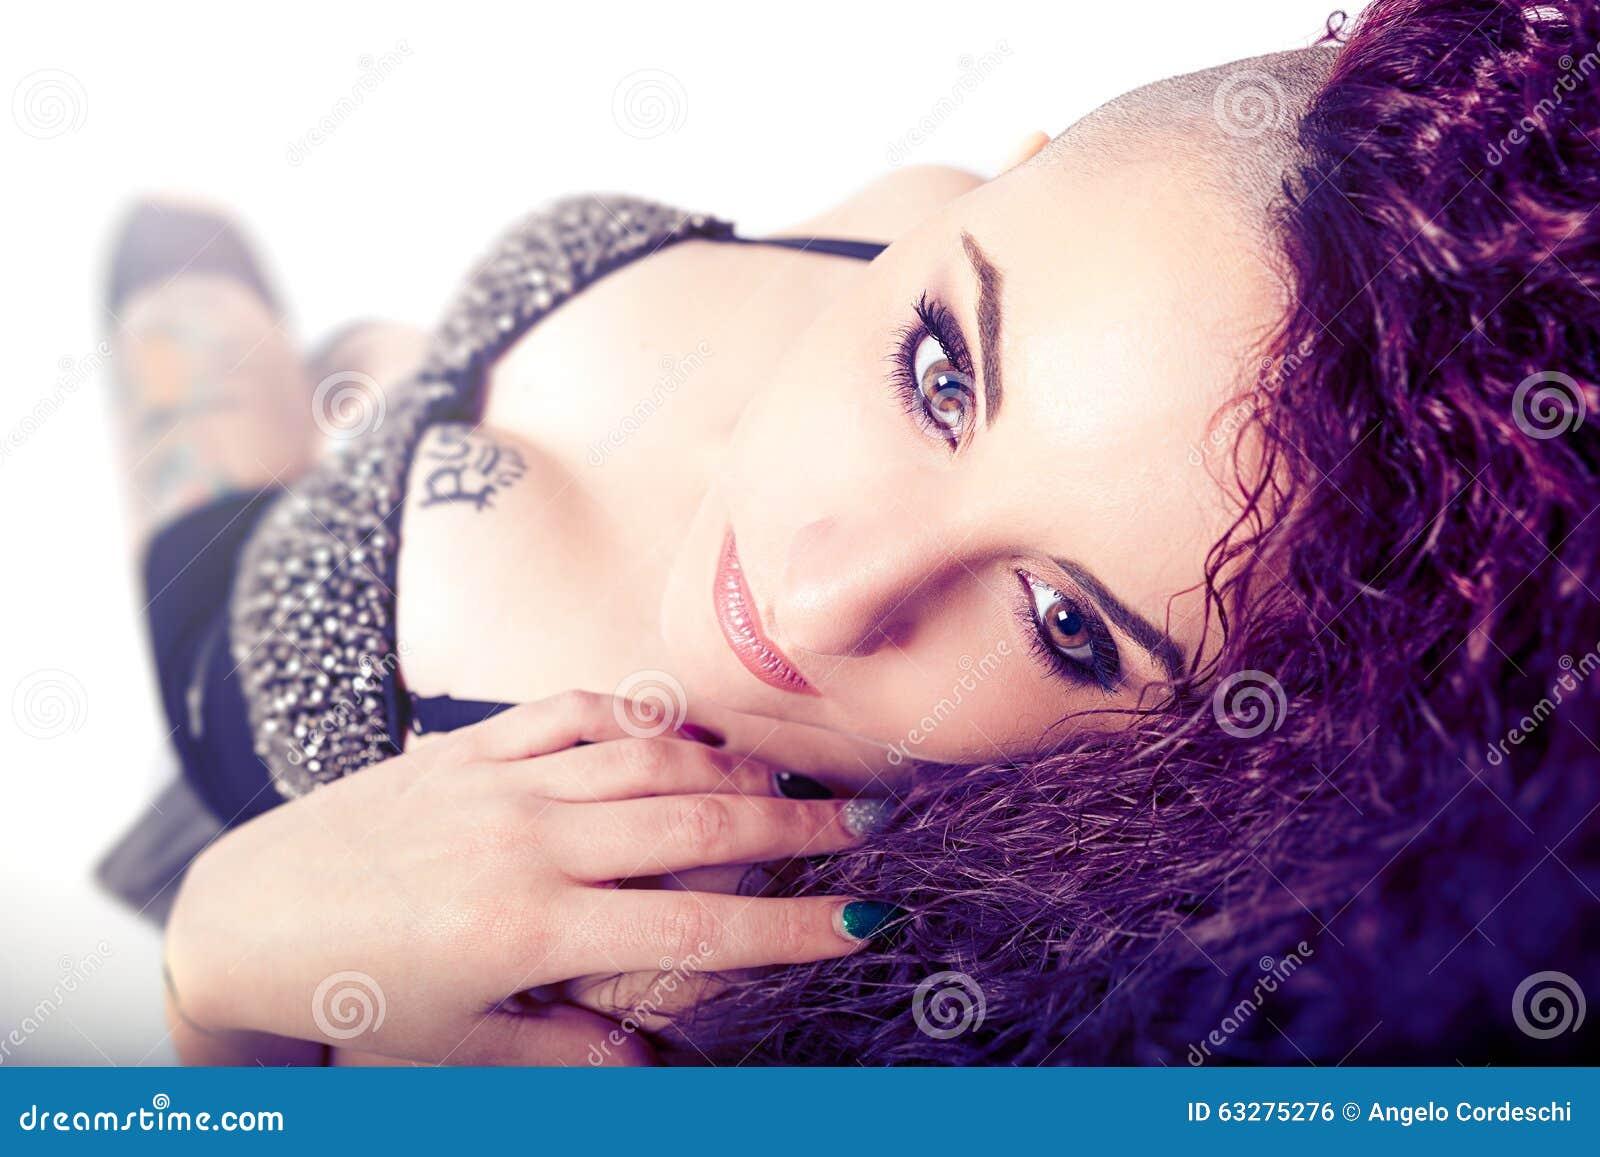 bald punk chick model